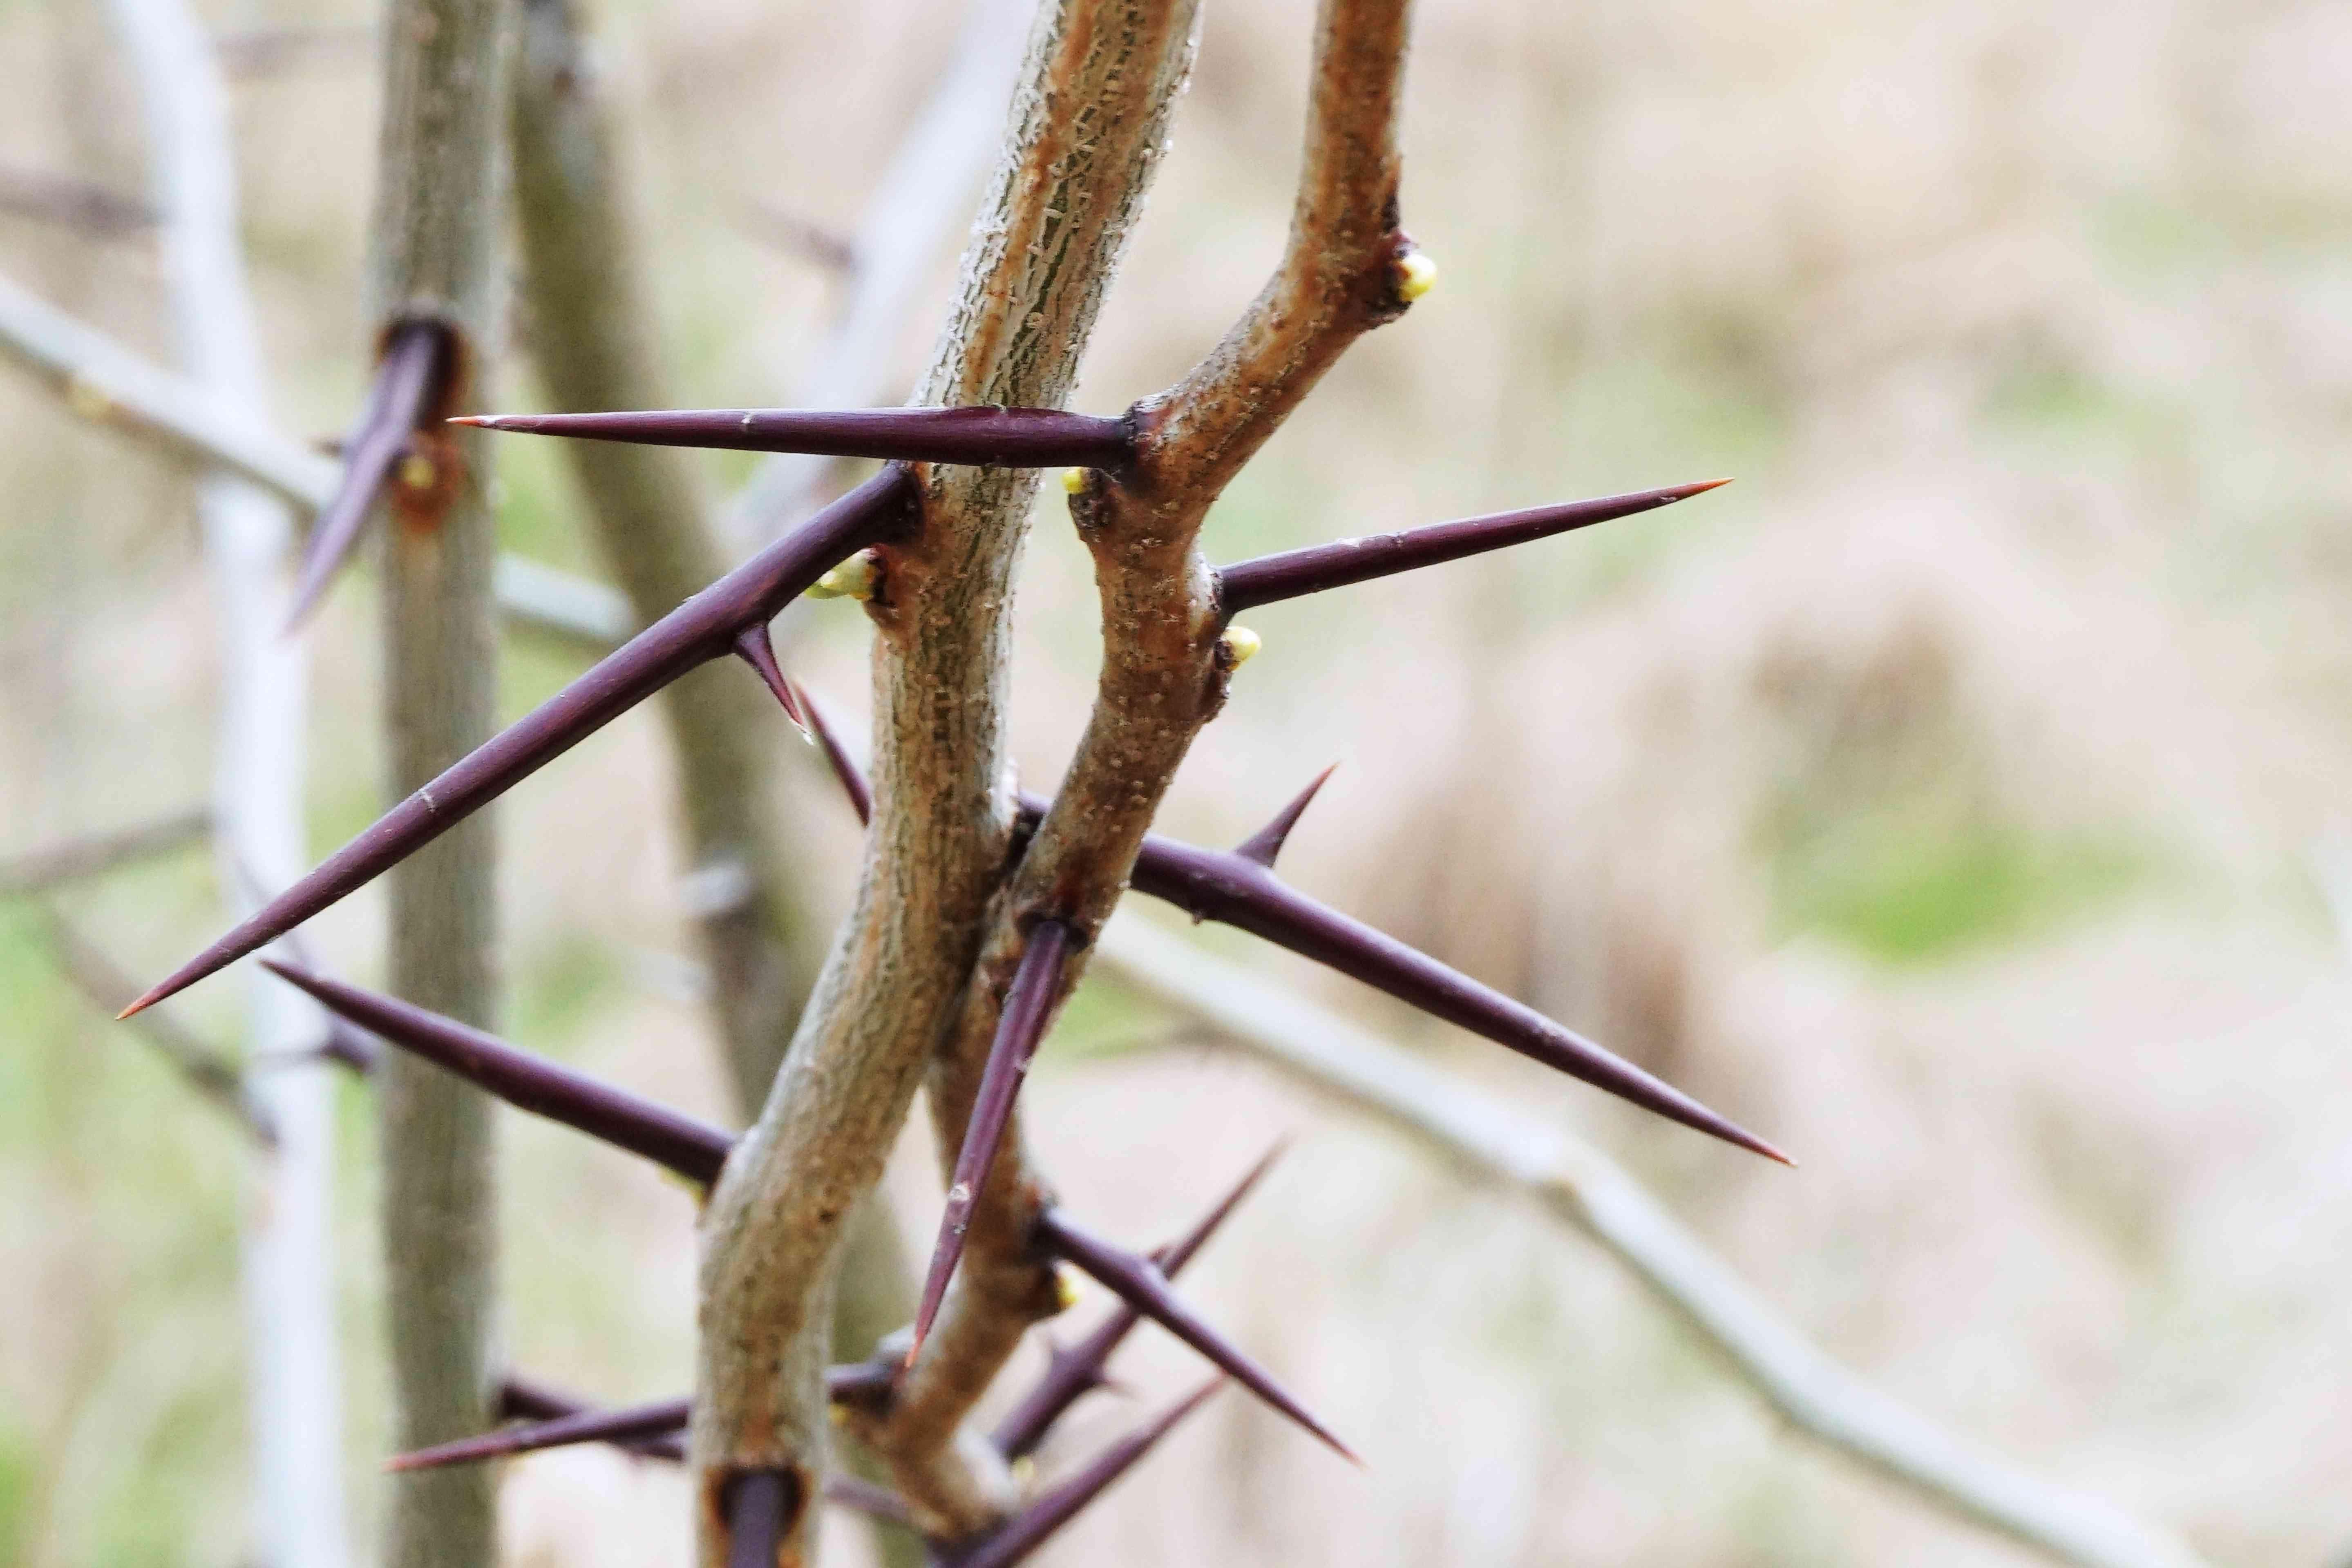 Thorns on the bark of the honey locust tree